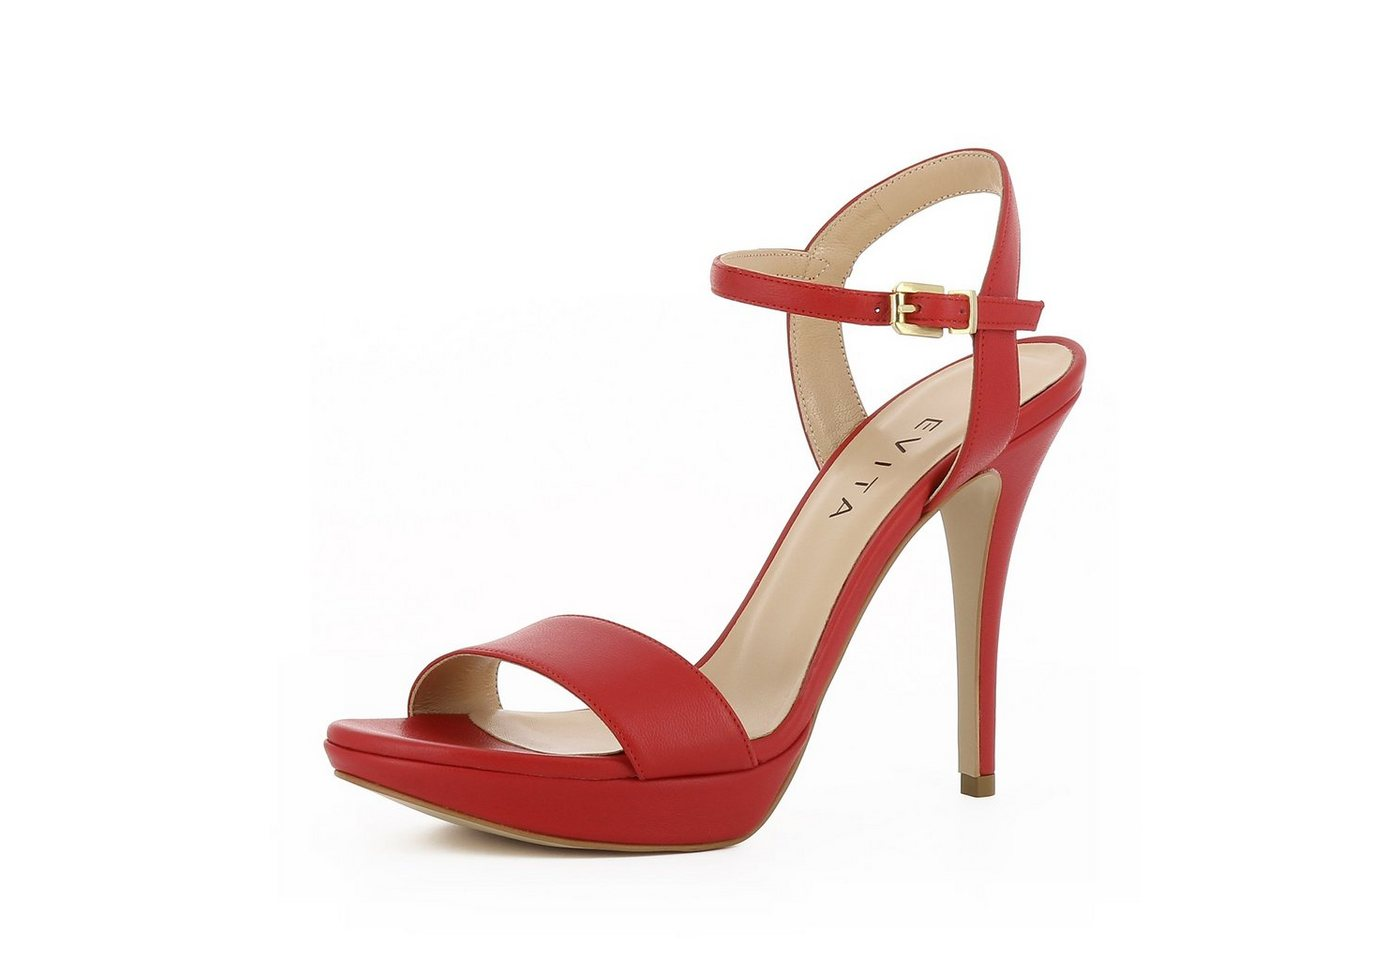 Evita »VALERIA« High-Heel-Sandalette   Schuhe > High Heels > High Heel Sandaletten   Rot   Evita